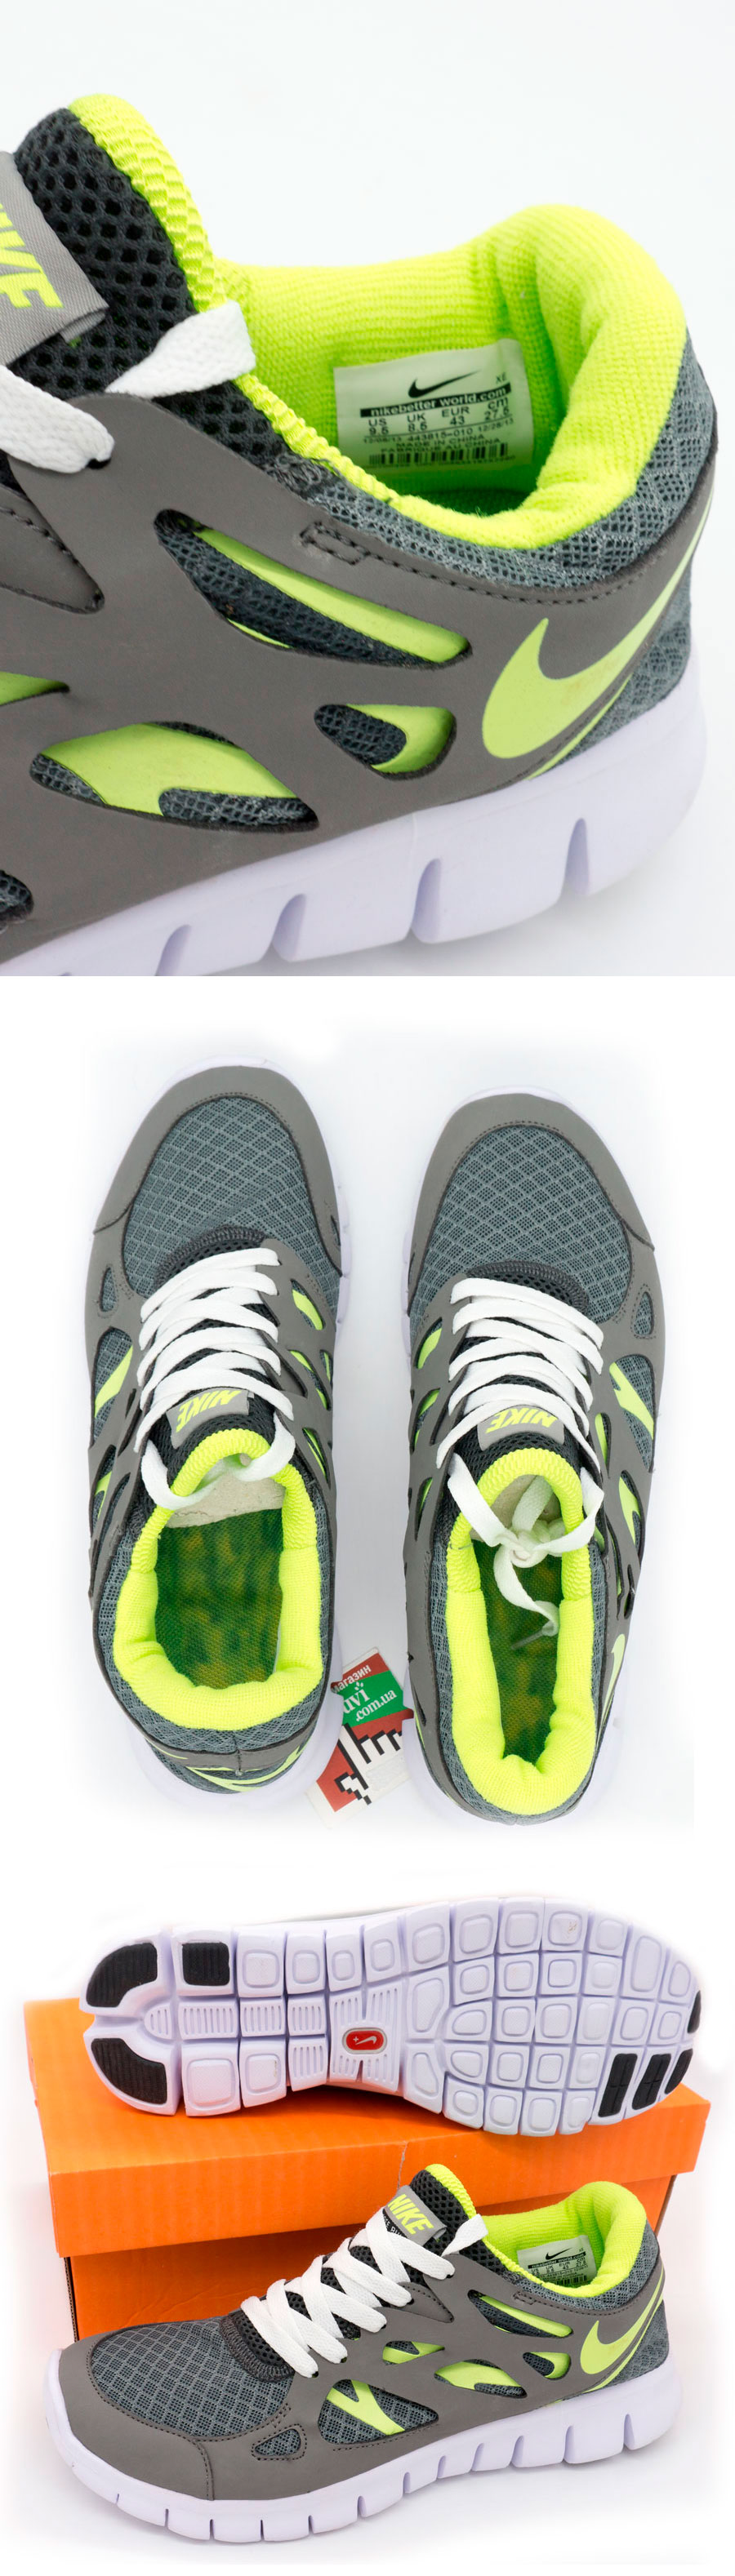 большое фото №6 Кроссовки для бега Nike Free Run 2 Найк Фри Ран, серо-белые